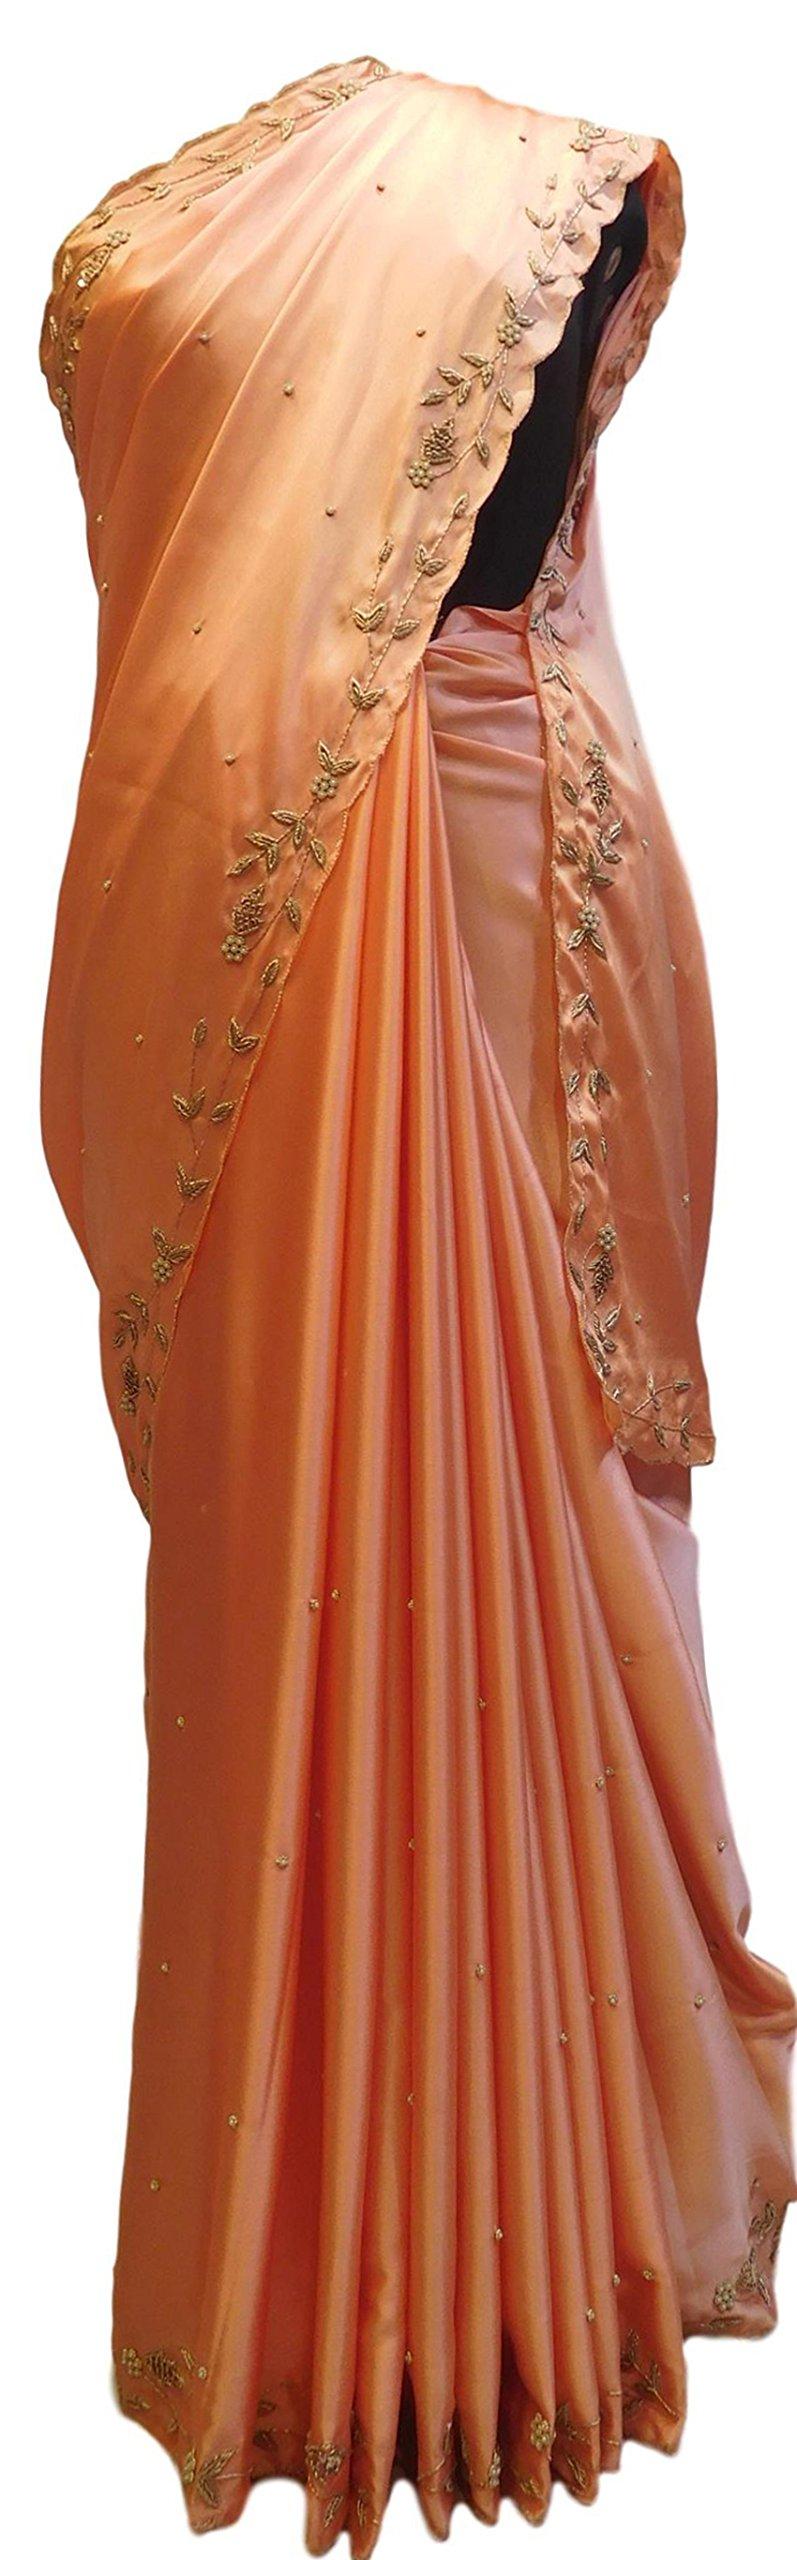 SMSAREE Peach Designer Bridal PartyWear Silk Bullion Pearl Beads Stone Work Wedding Cutwork Border Saree Sari E030